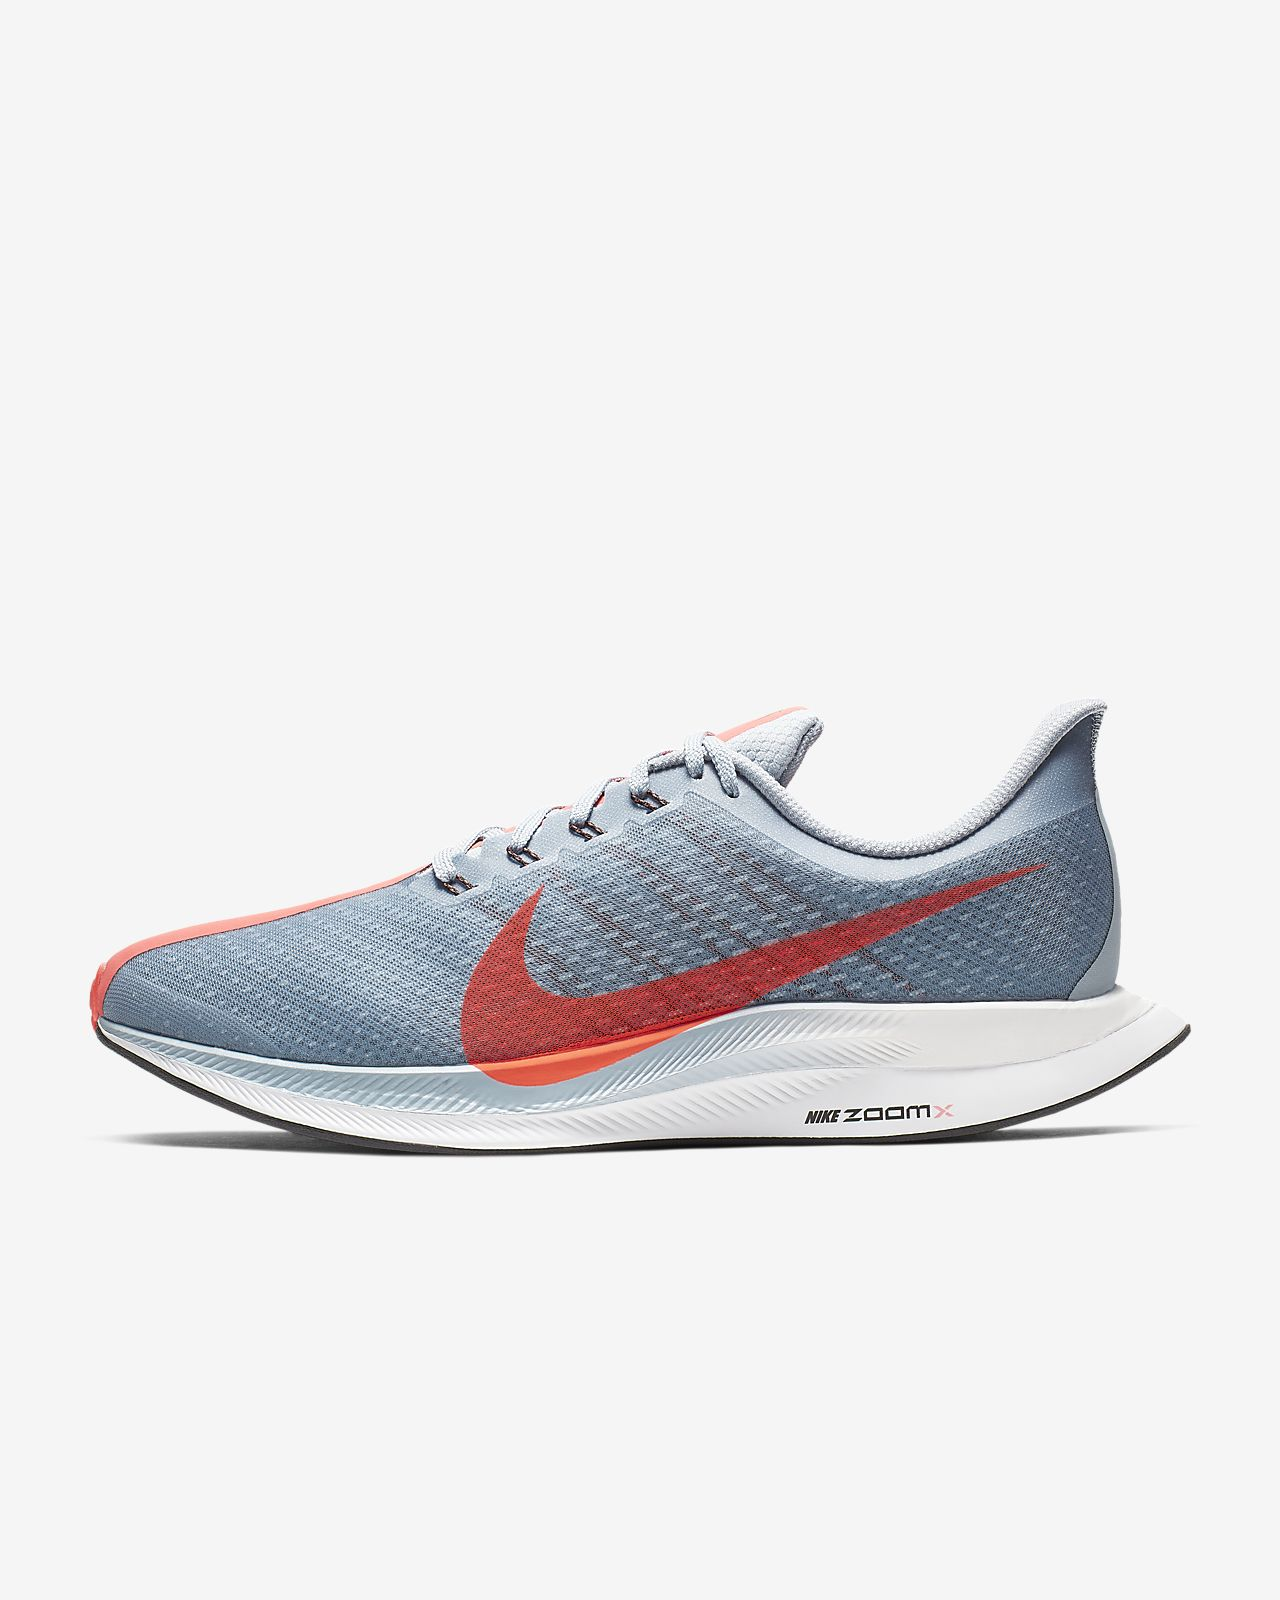 buy cheap d38ce 503aa ... Chaussure de running Nike Zoom Pegasus Turbo pour Homme